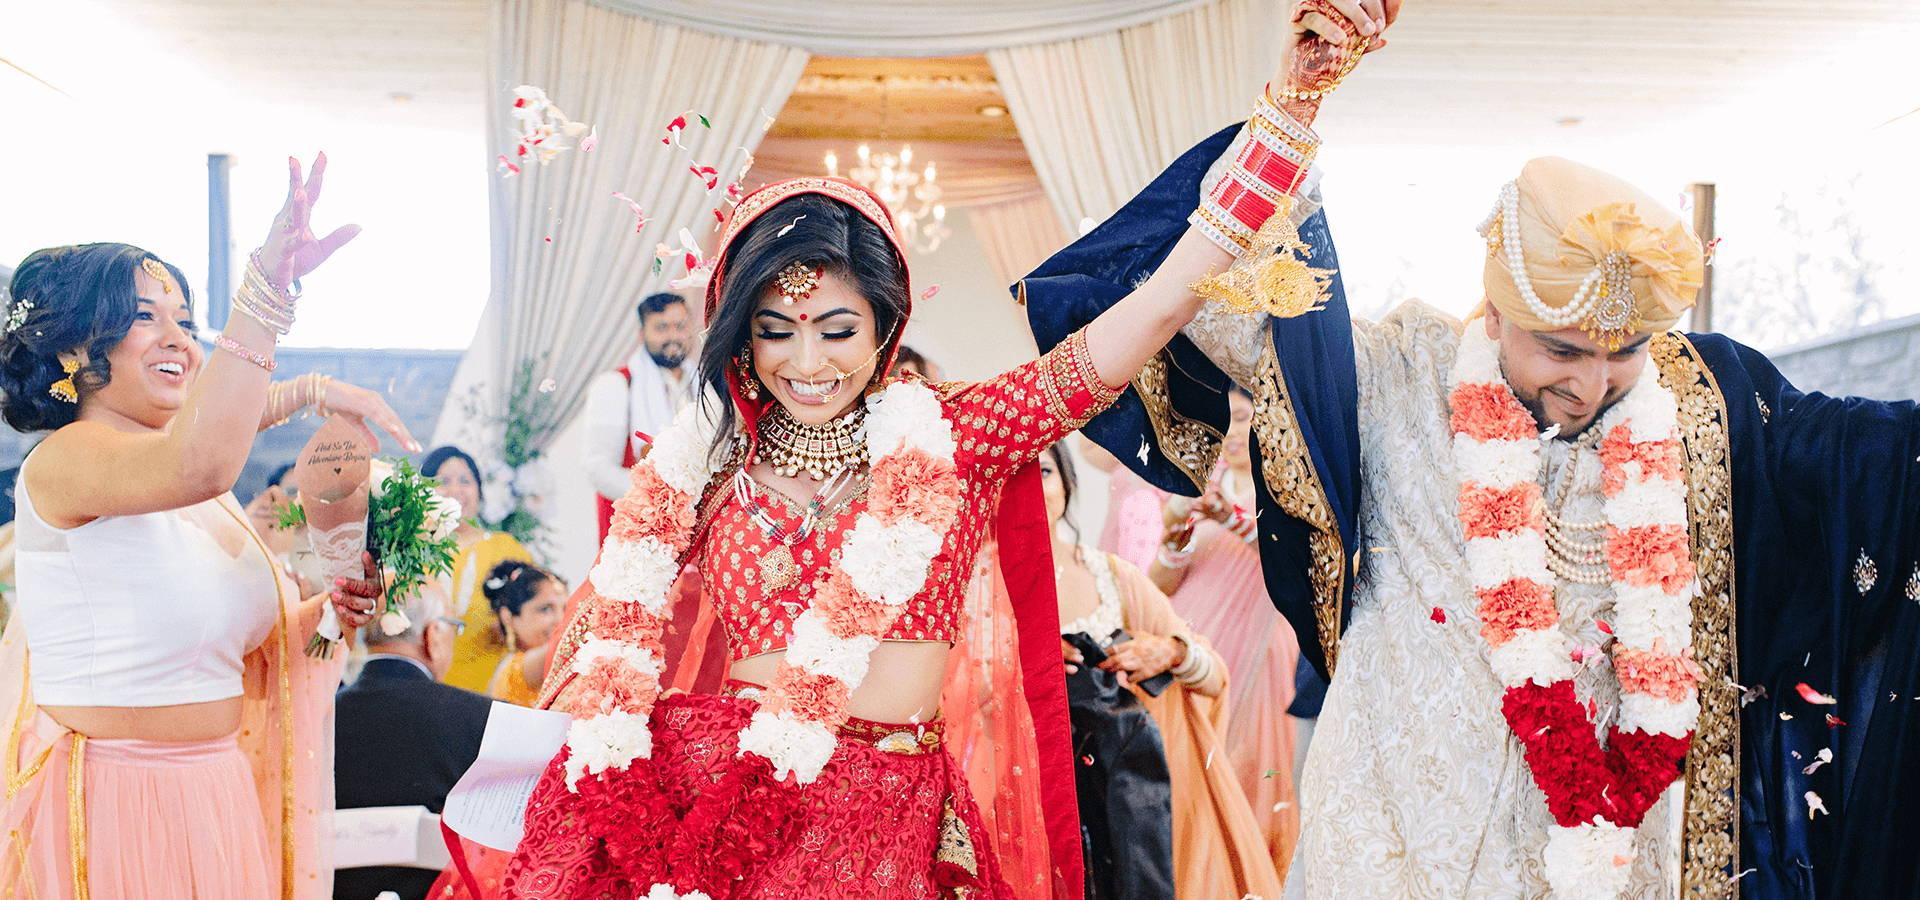 when to book your preferred wedding vendors, 1